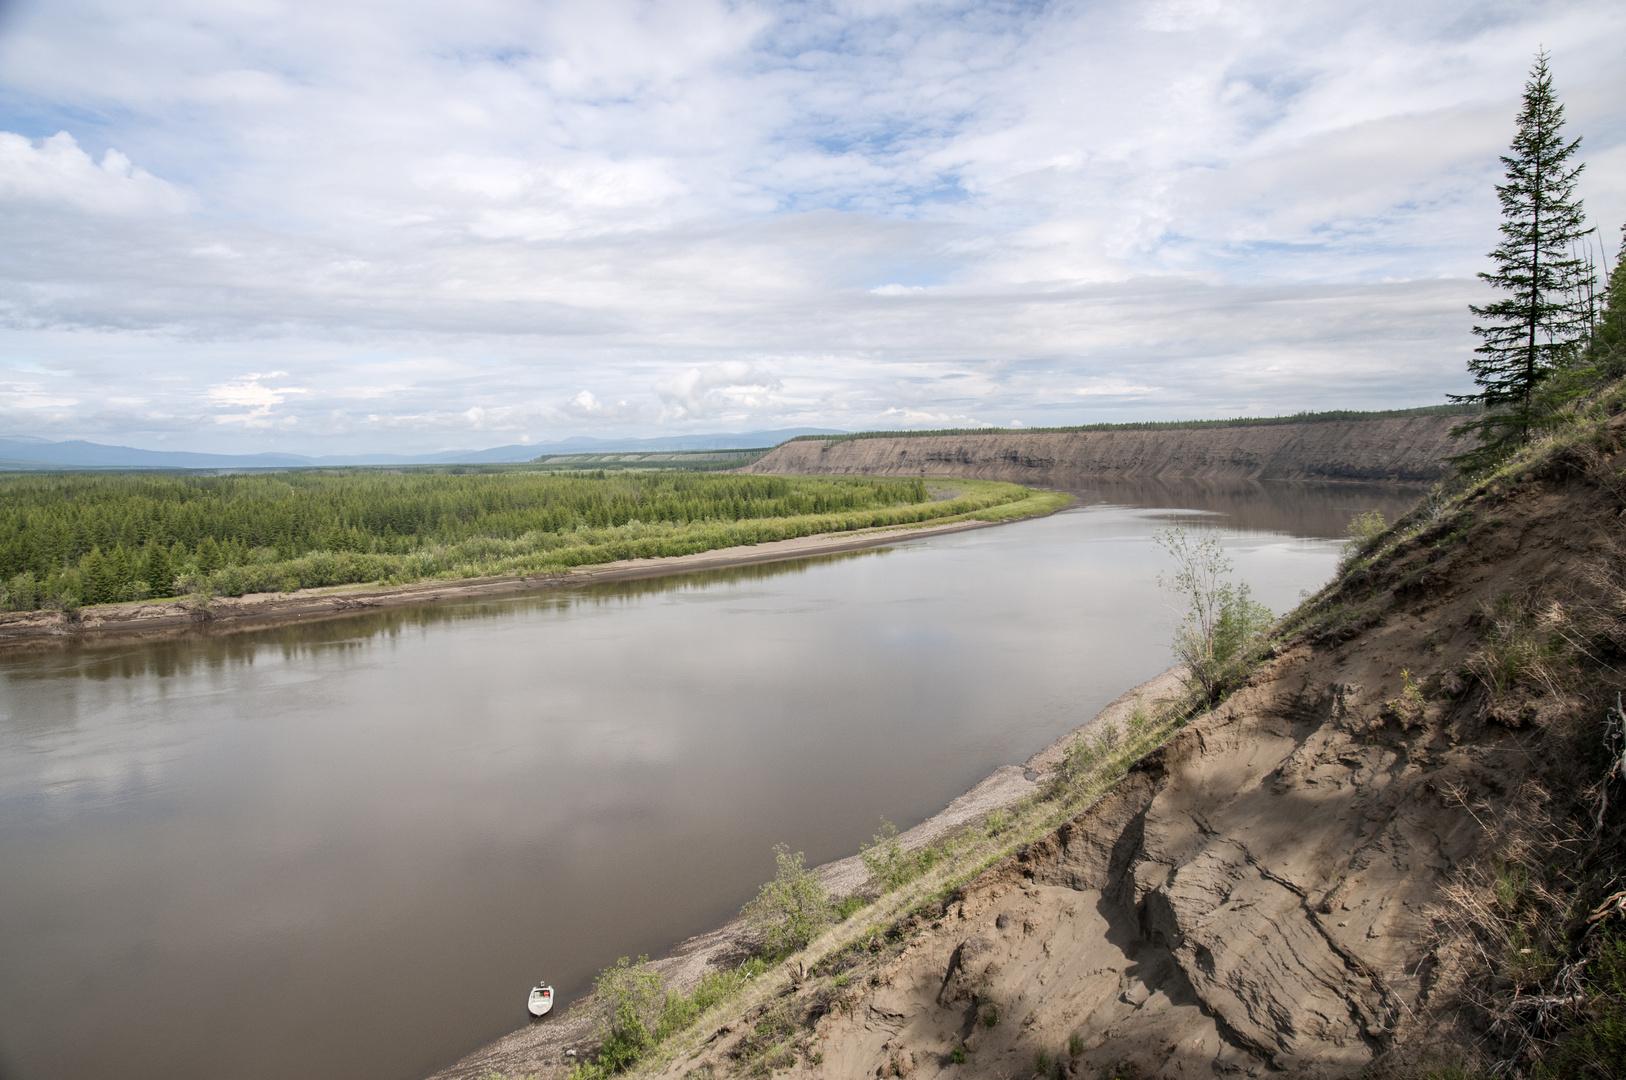 Adycha River, Siberia 2